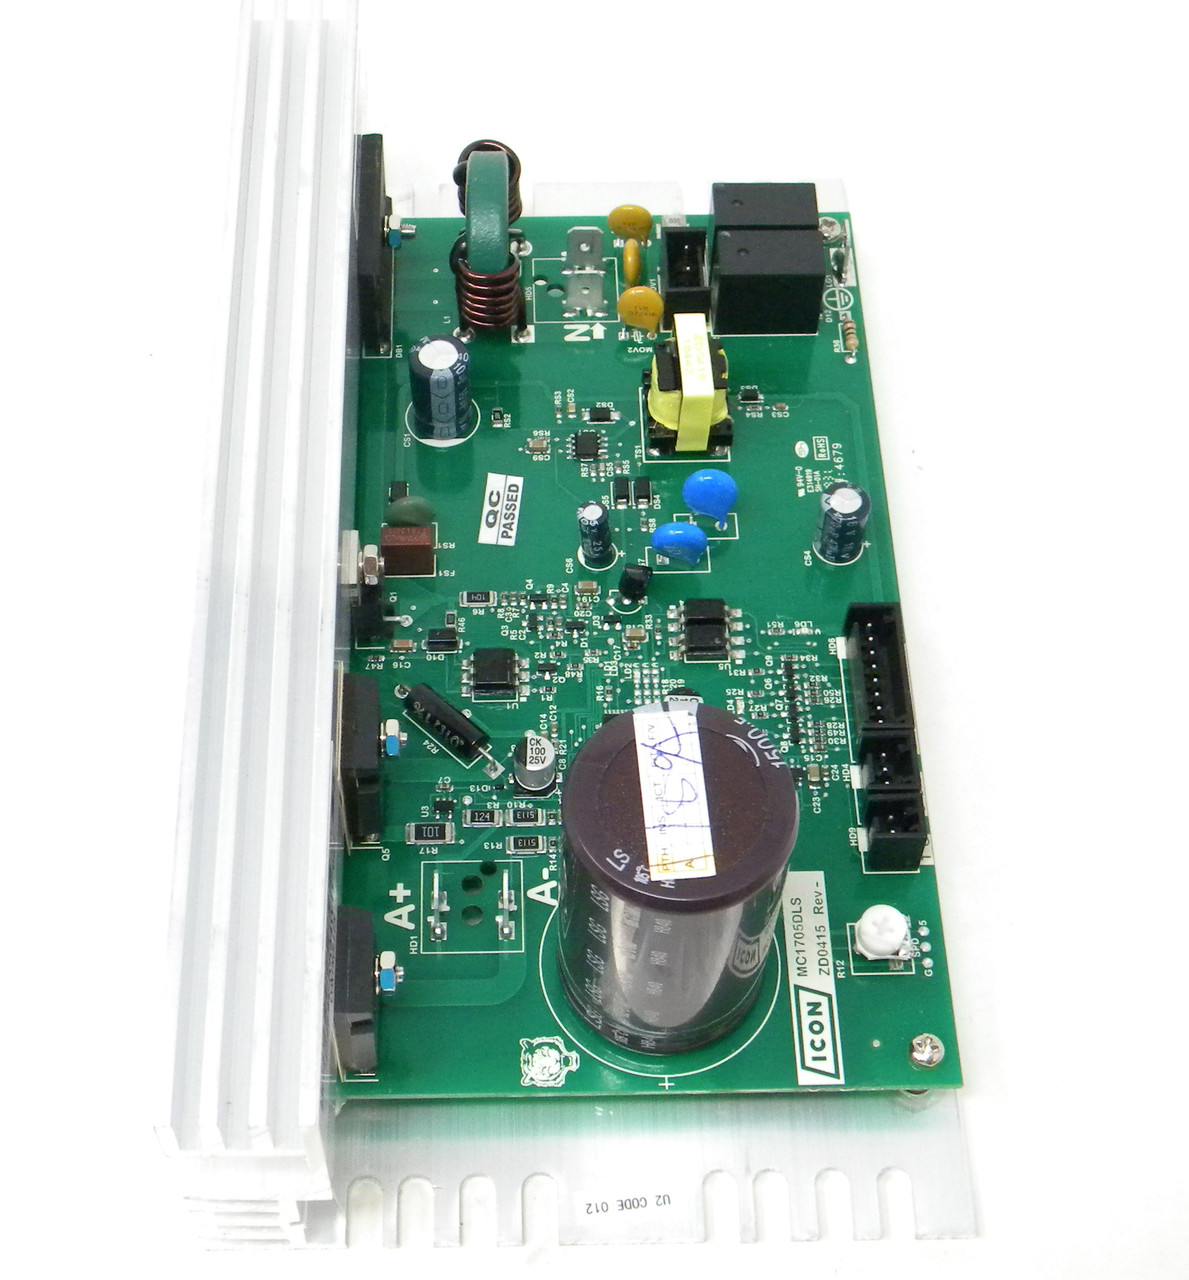 PROFORM Treadmill Model PFTL13113 PRO 2000 Motor Controller MC1618DLS Part Number 398074